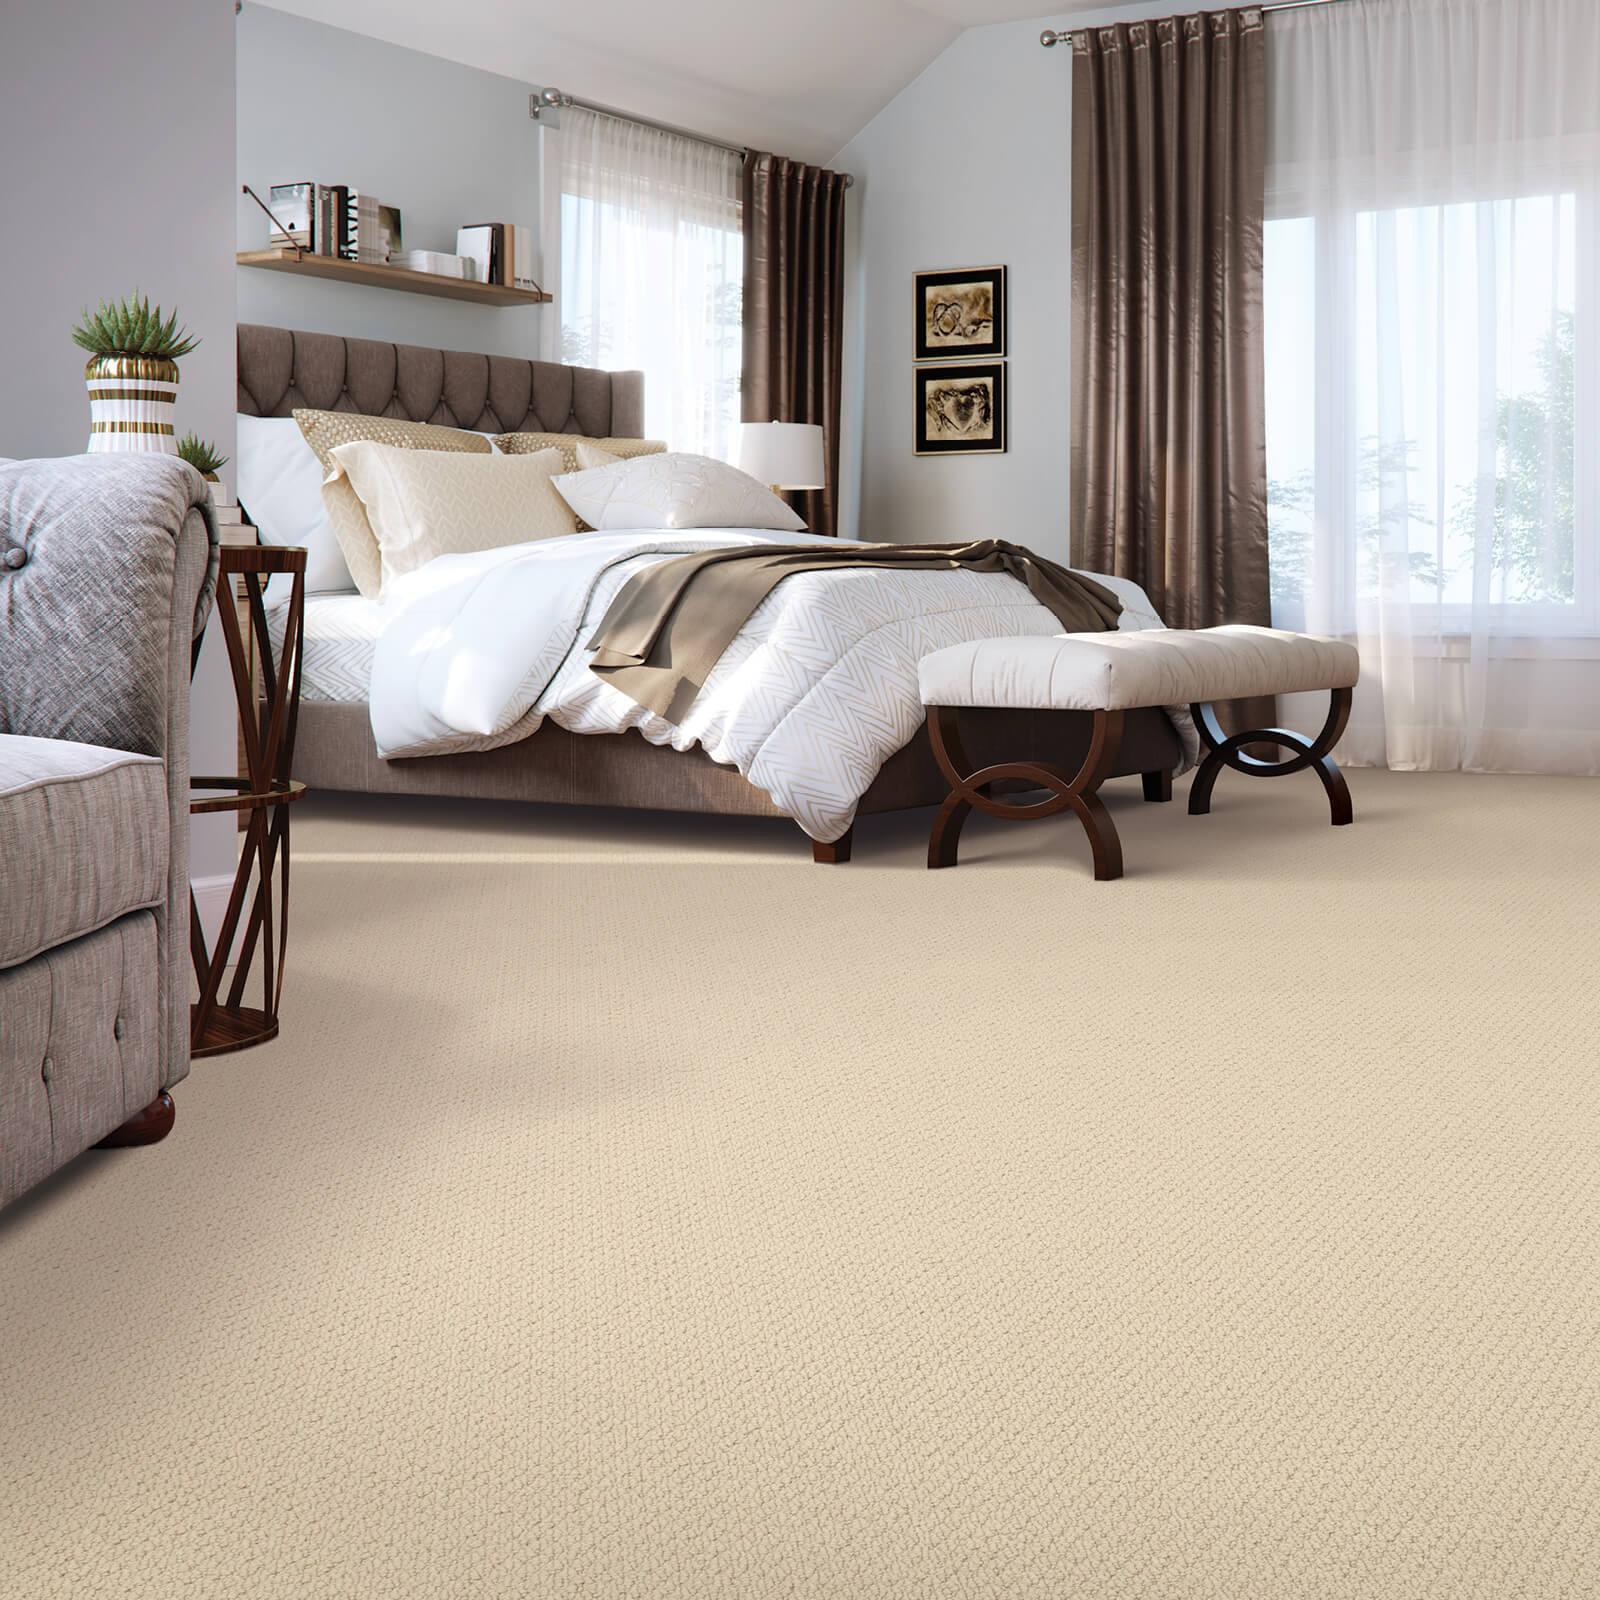 Spacious bedroom   We'll Floor You